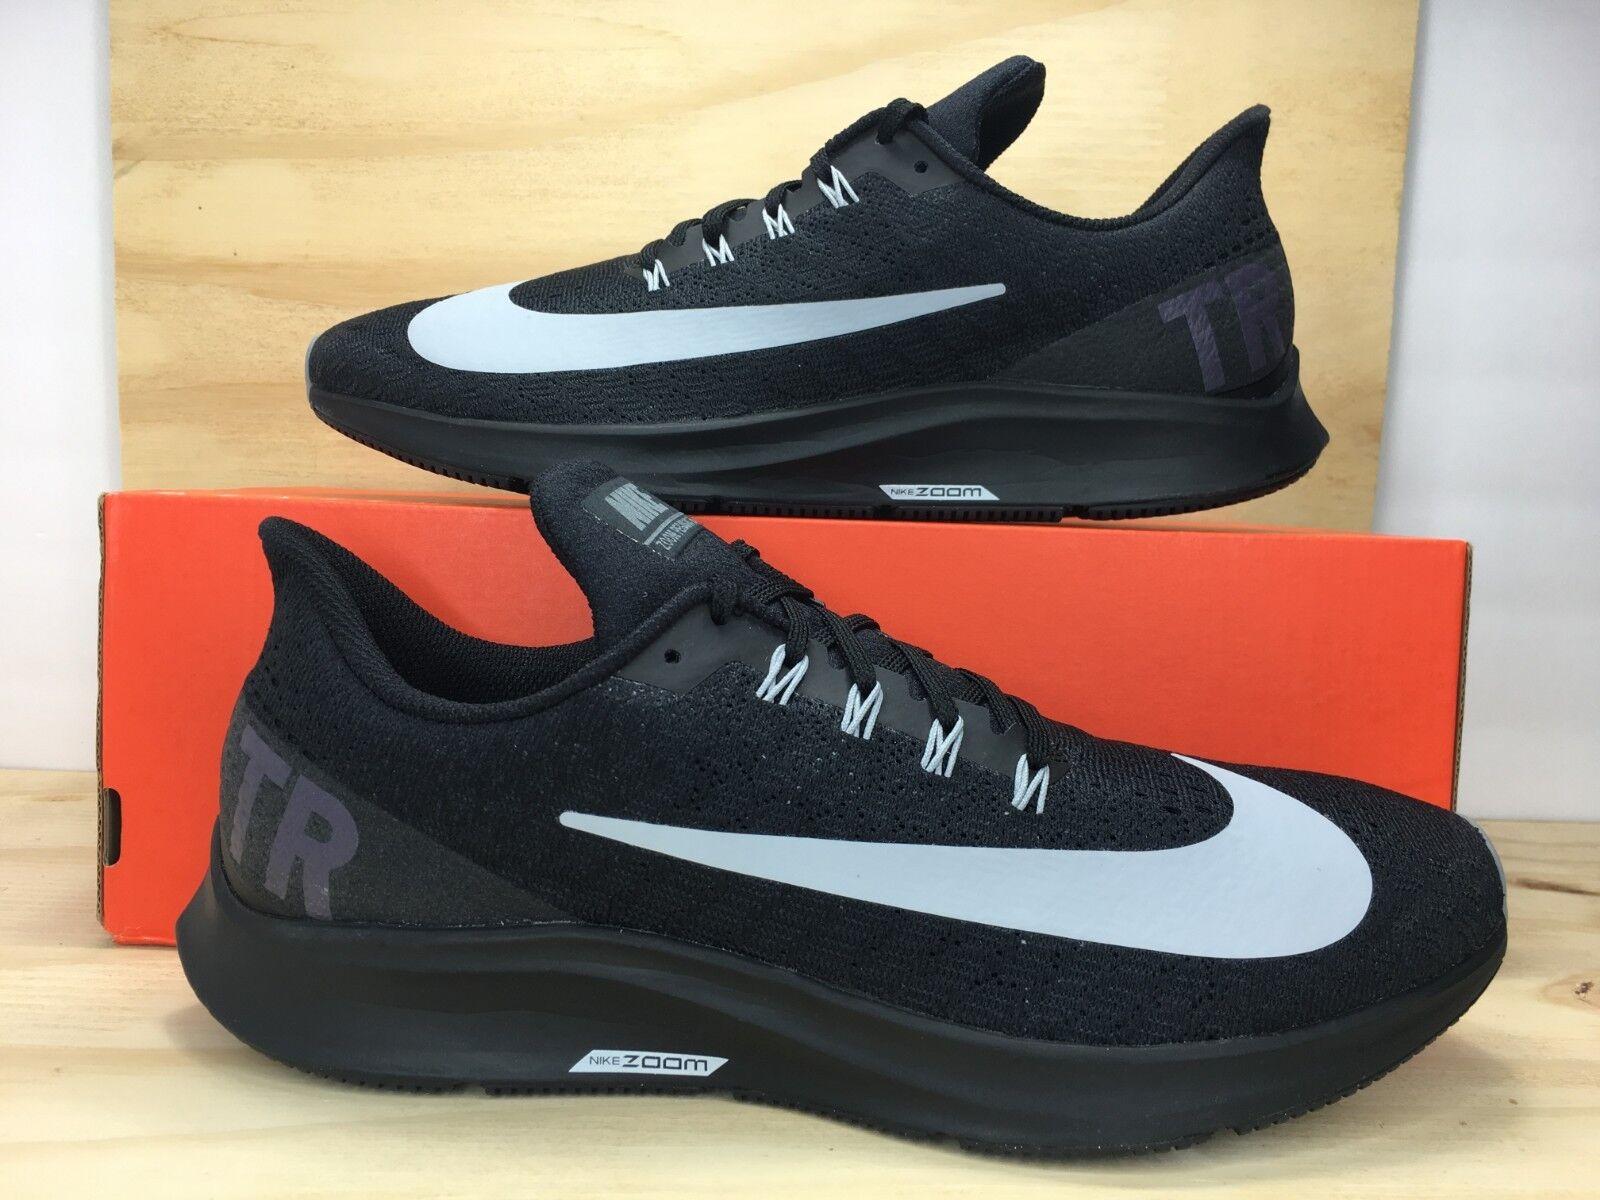 release date 2ae20 87f02 Nike air zoom pegasus 35 id id id schwarze graue männer laufschuh größe 9,5